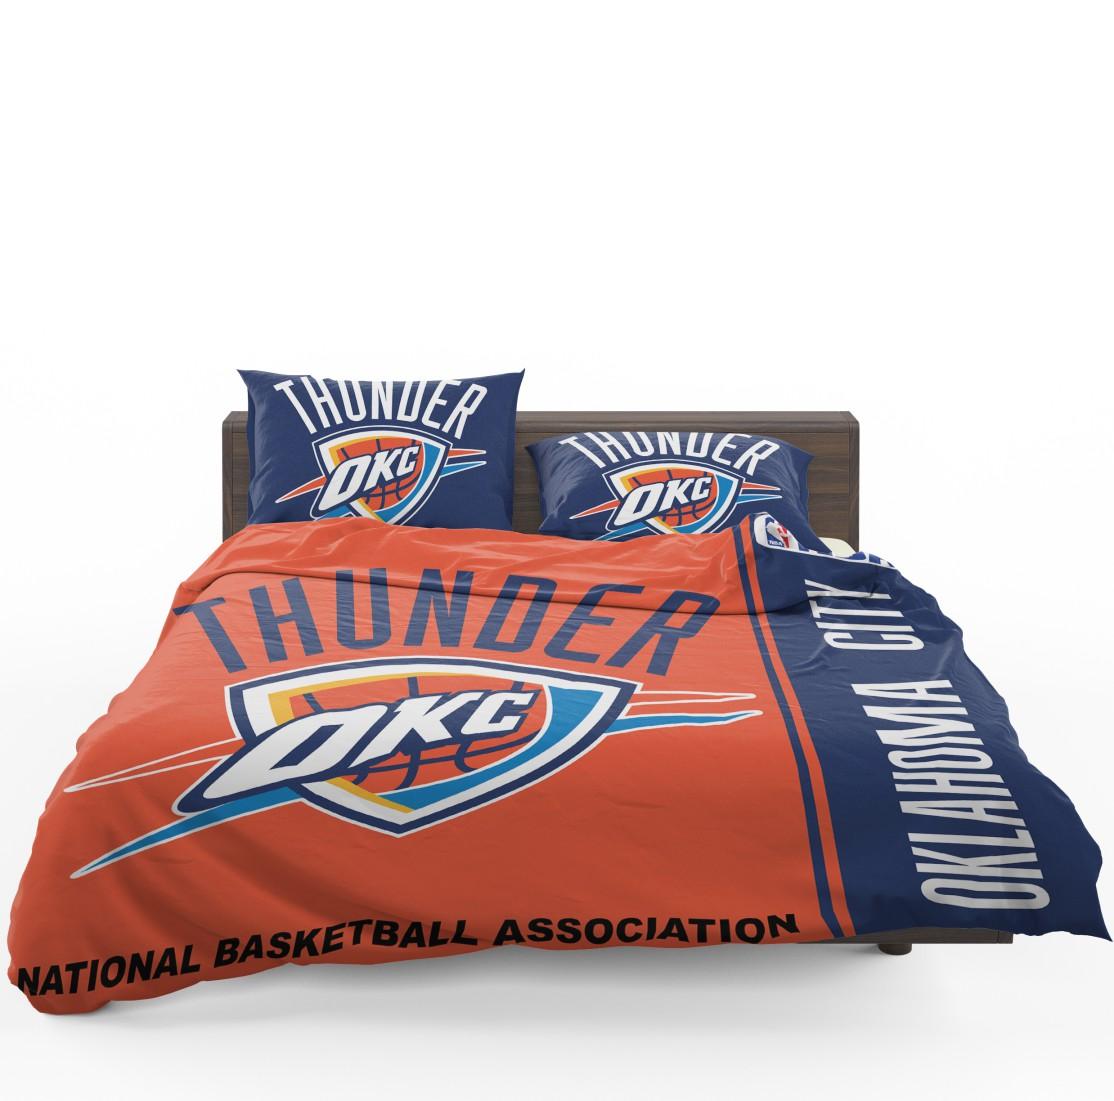 Oklahoma City Thunder Nba Basketball Bedding Set Ebeddingsets